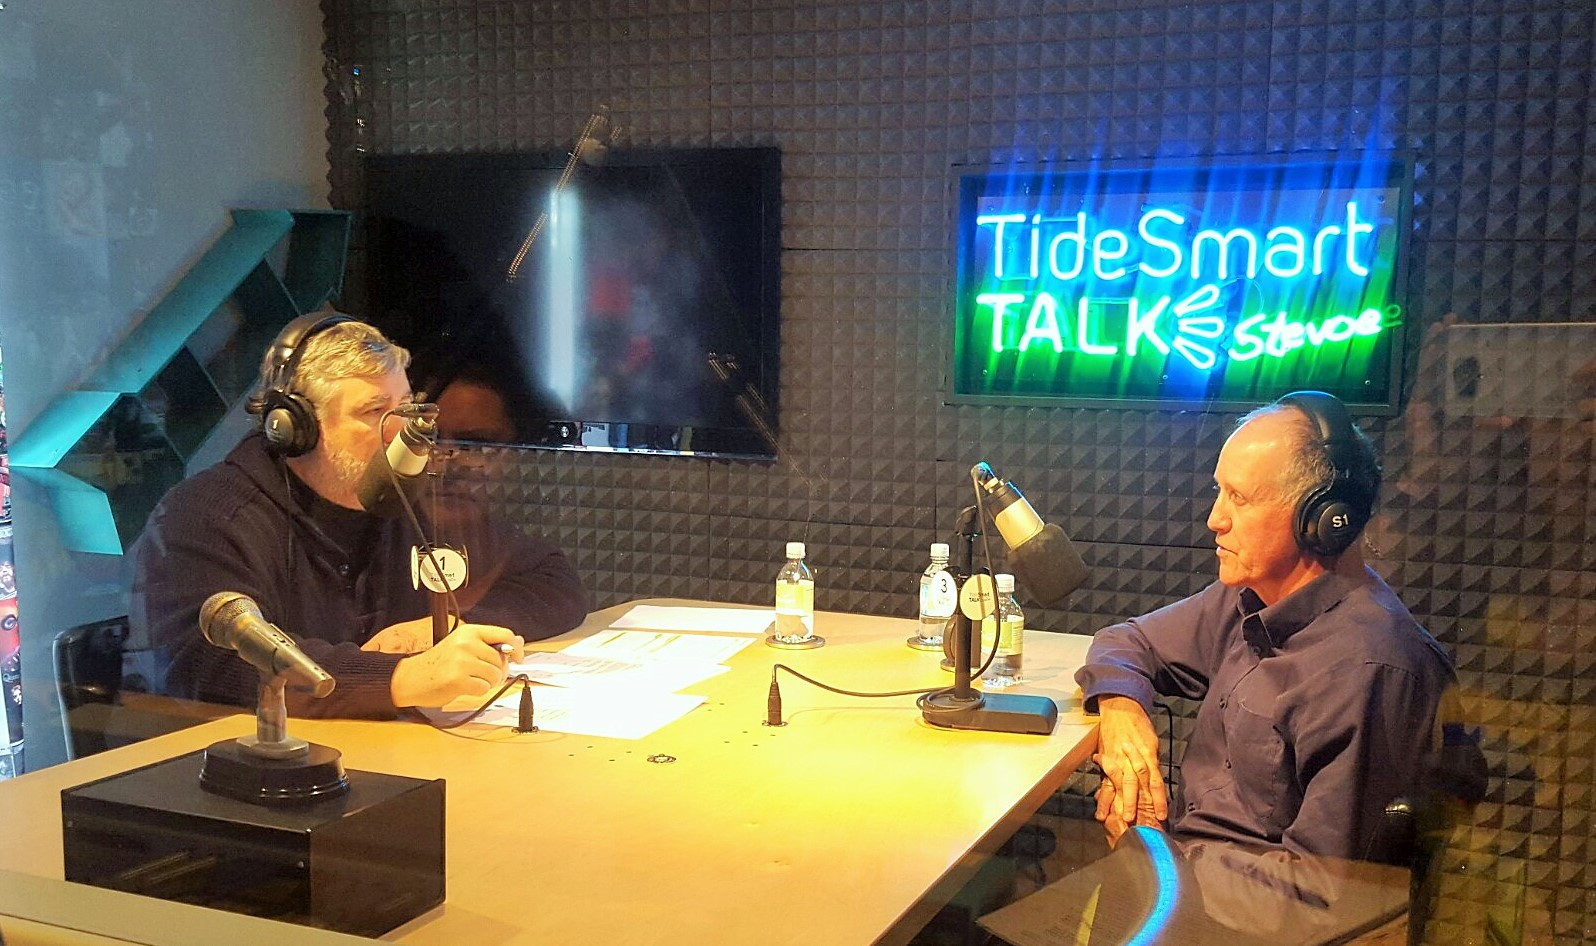 Host of TideSmart Talk with Stevoe, Steve Woods, welcomed Baxter State Park Director, Jensen Bissell (at right).